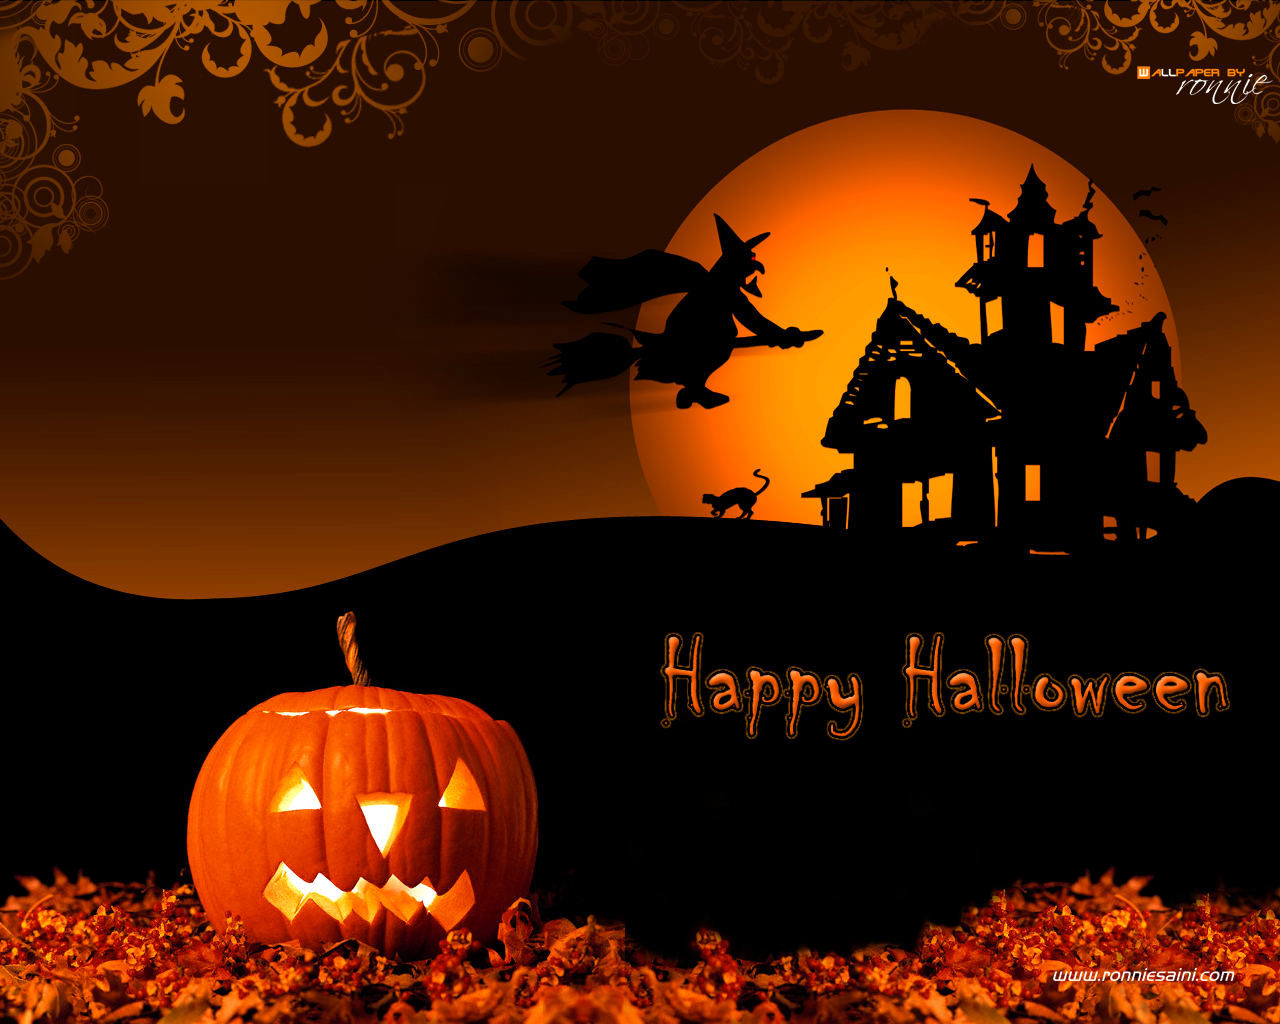 mi9comhalloween wallpaper free halloween wallpaper halloween desktop 1280x1024